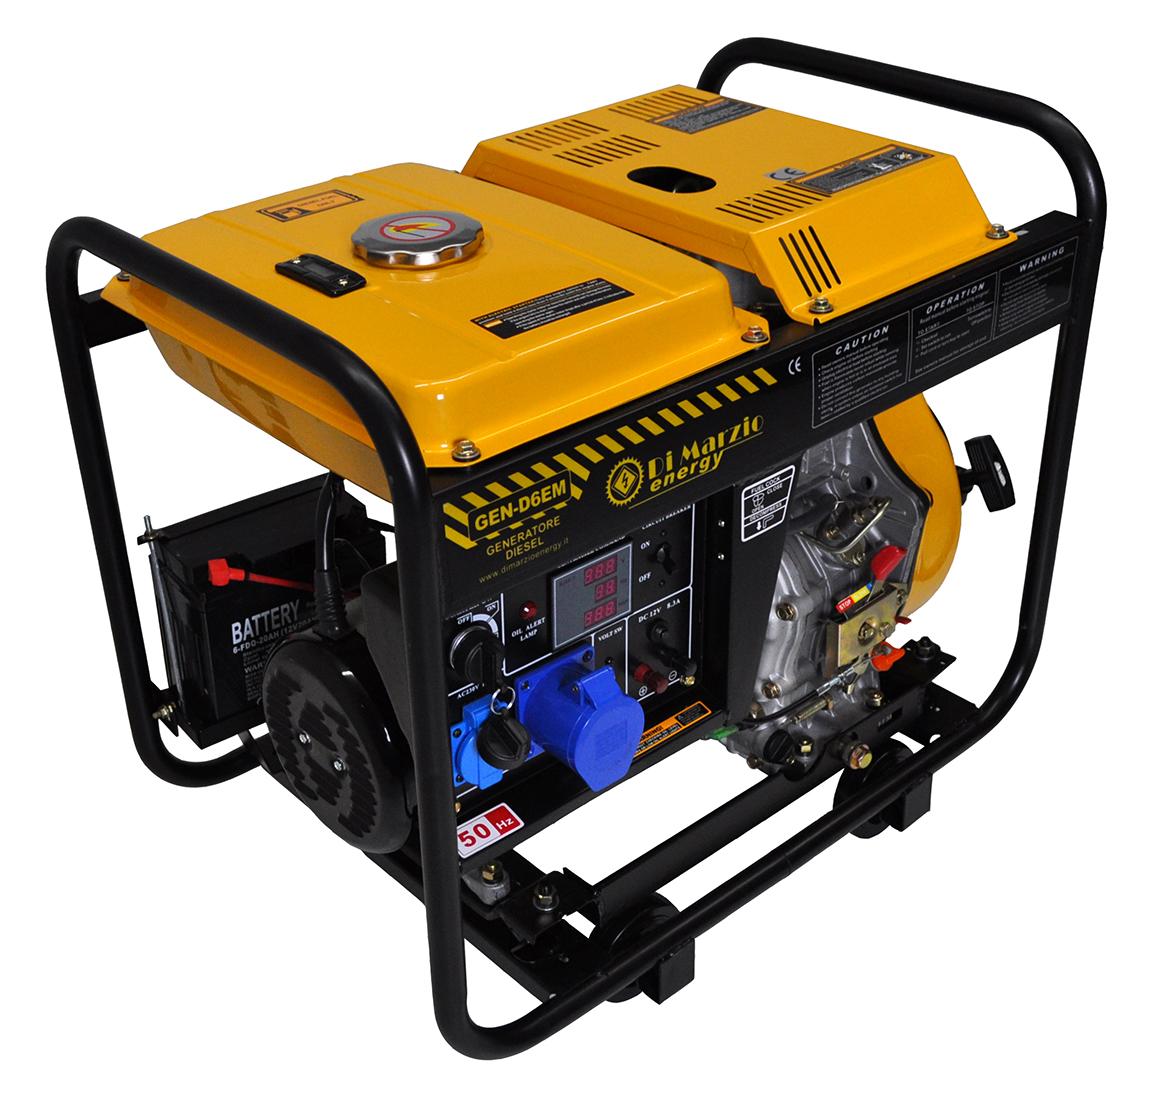 Generatore di corrente diesel 6 kw trifase silenziato for Generatore di corrente 10 kw